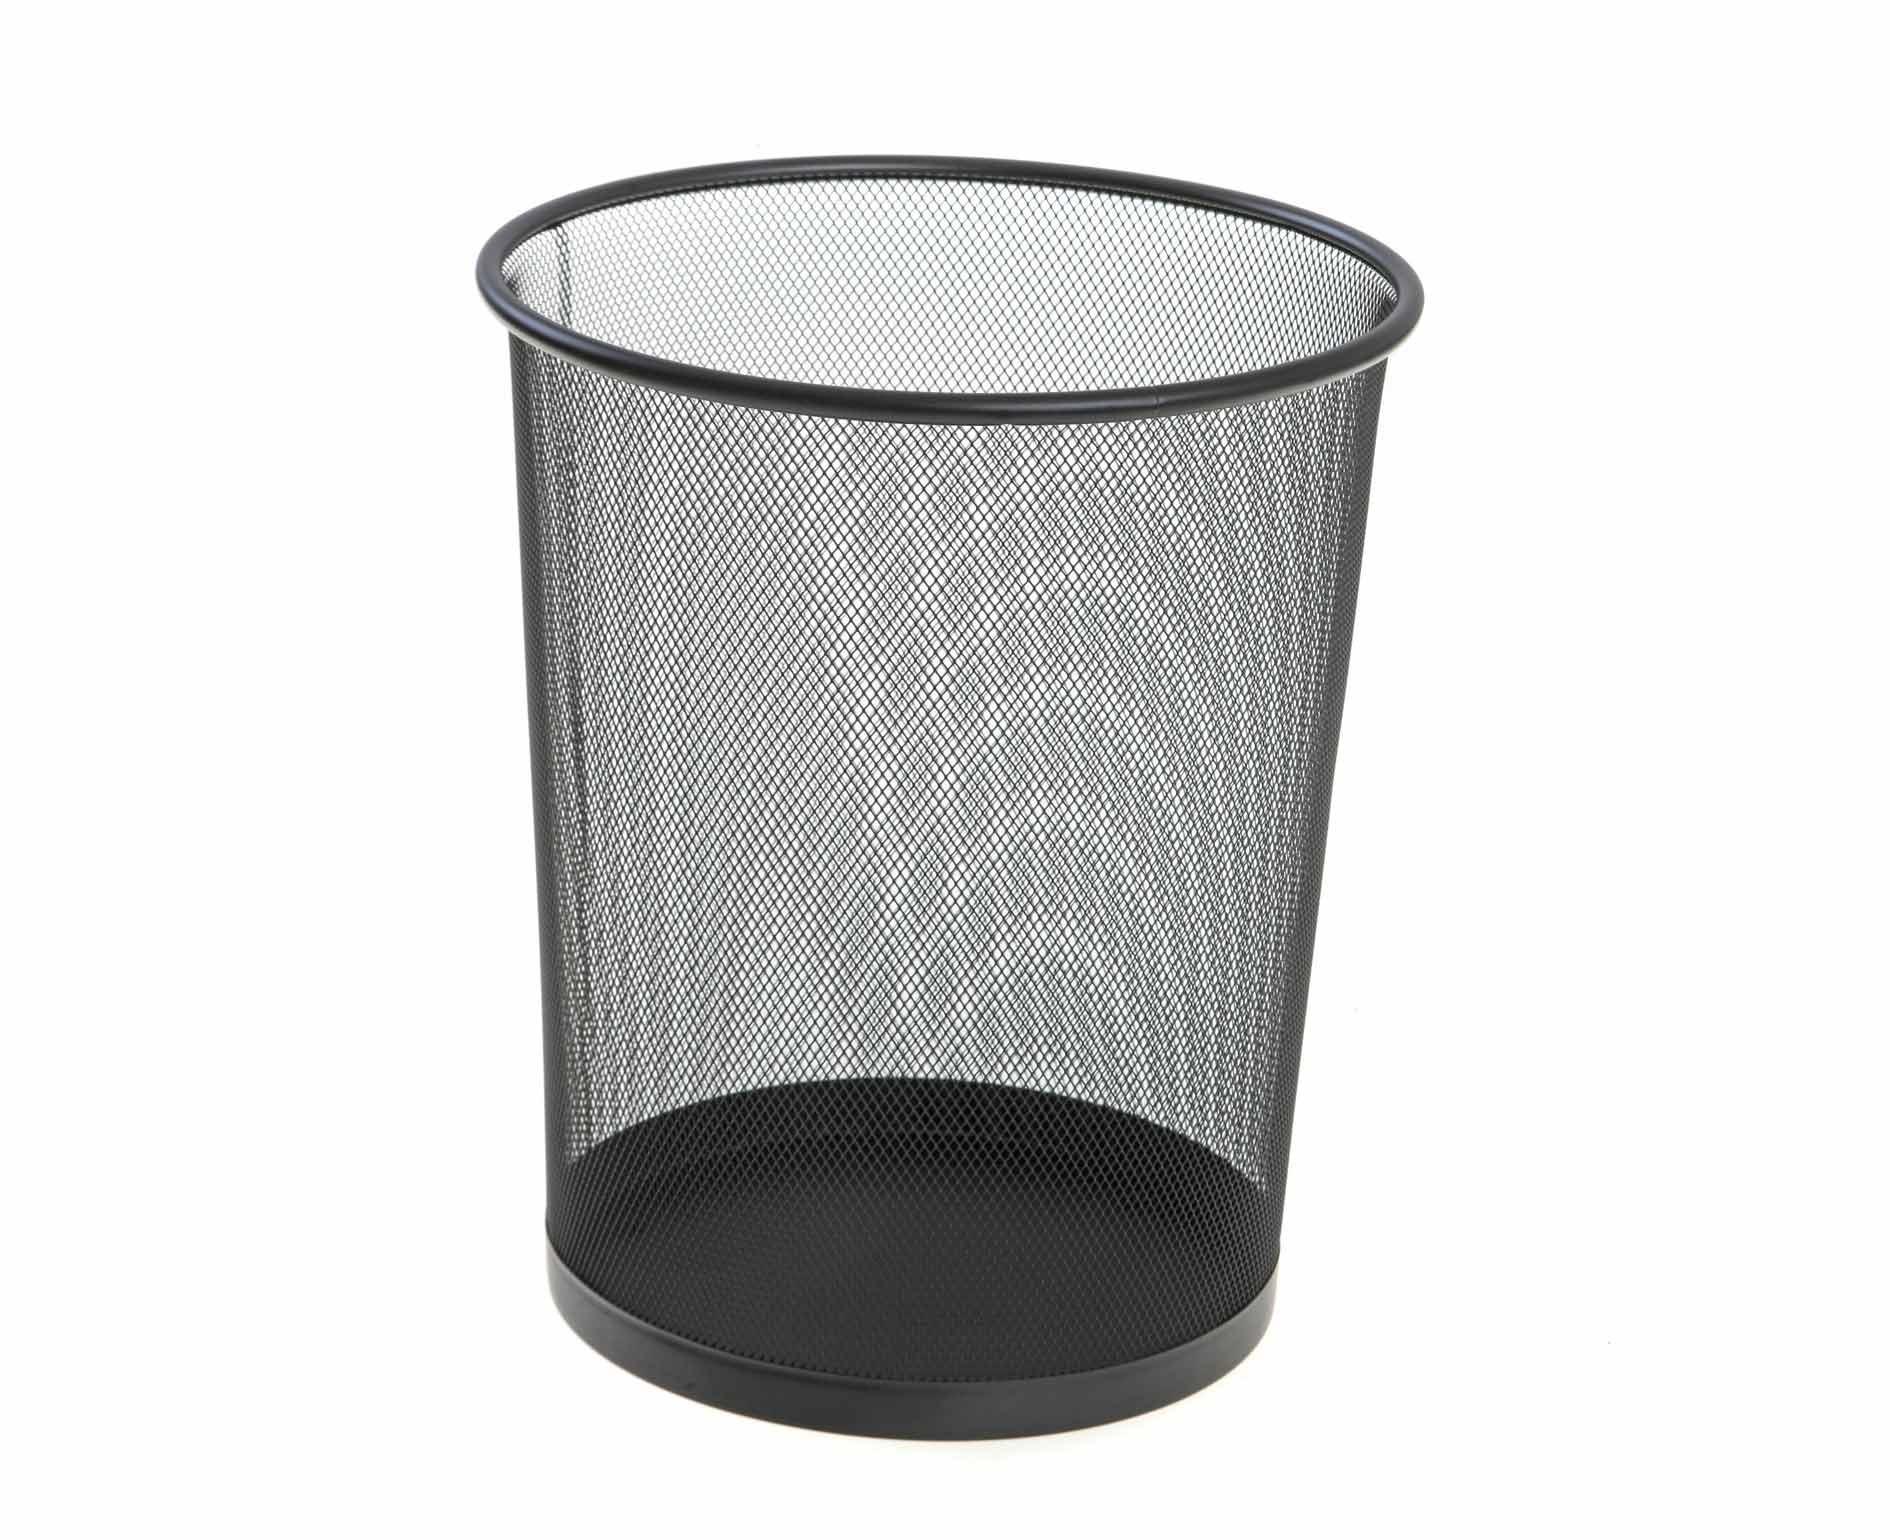 Metal Mesh Waste Bin Round Big Black